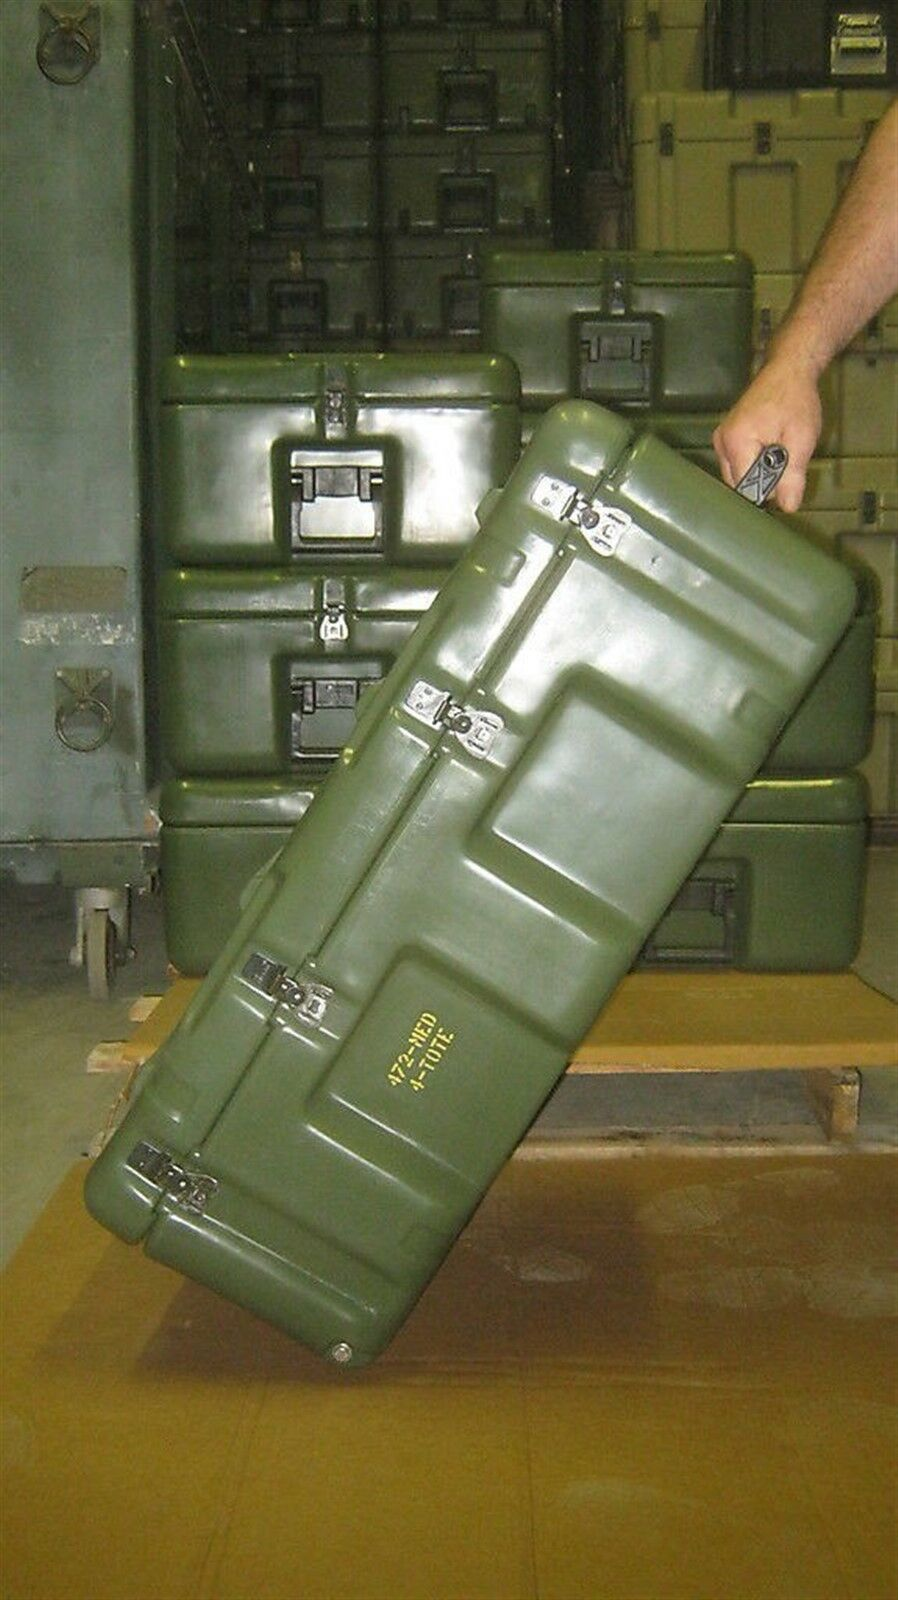 33x21x13 Hardigg Pelican Military Wheels Weathertight Case Survival BugOut Gear